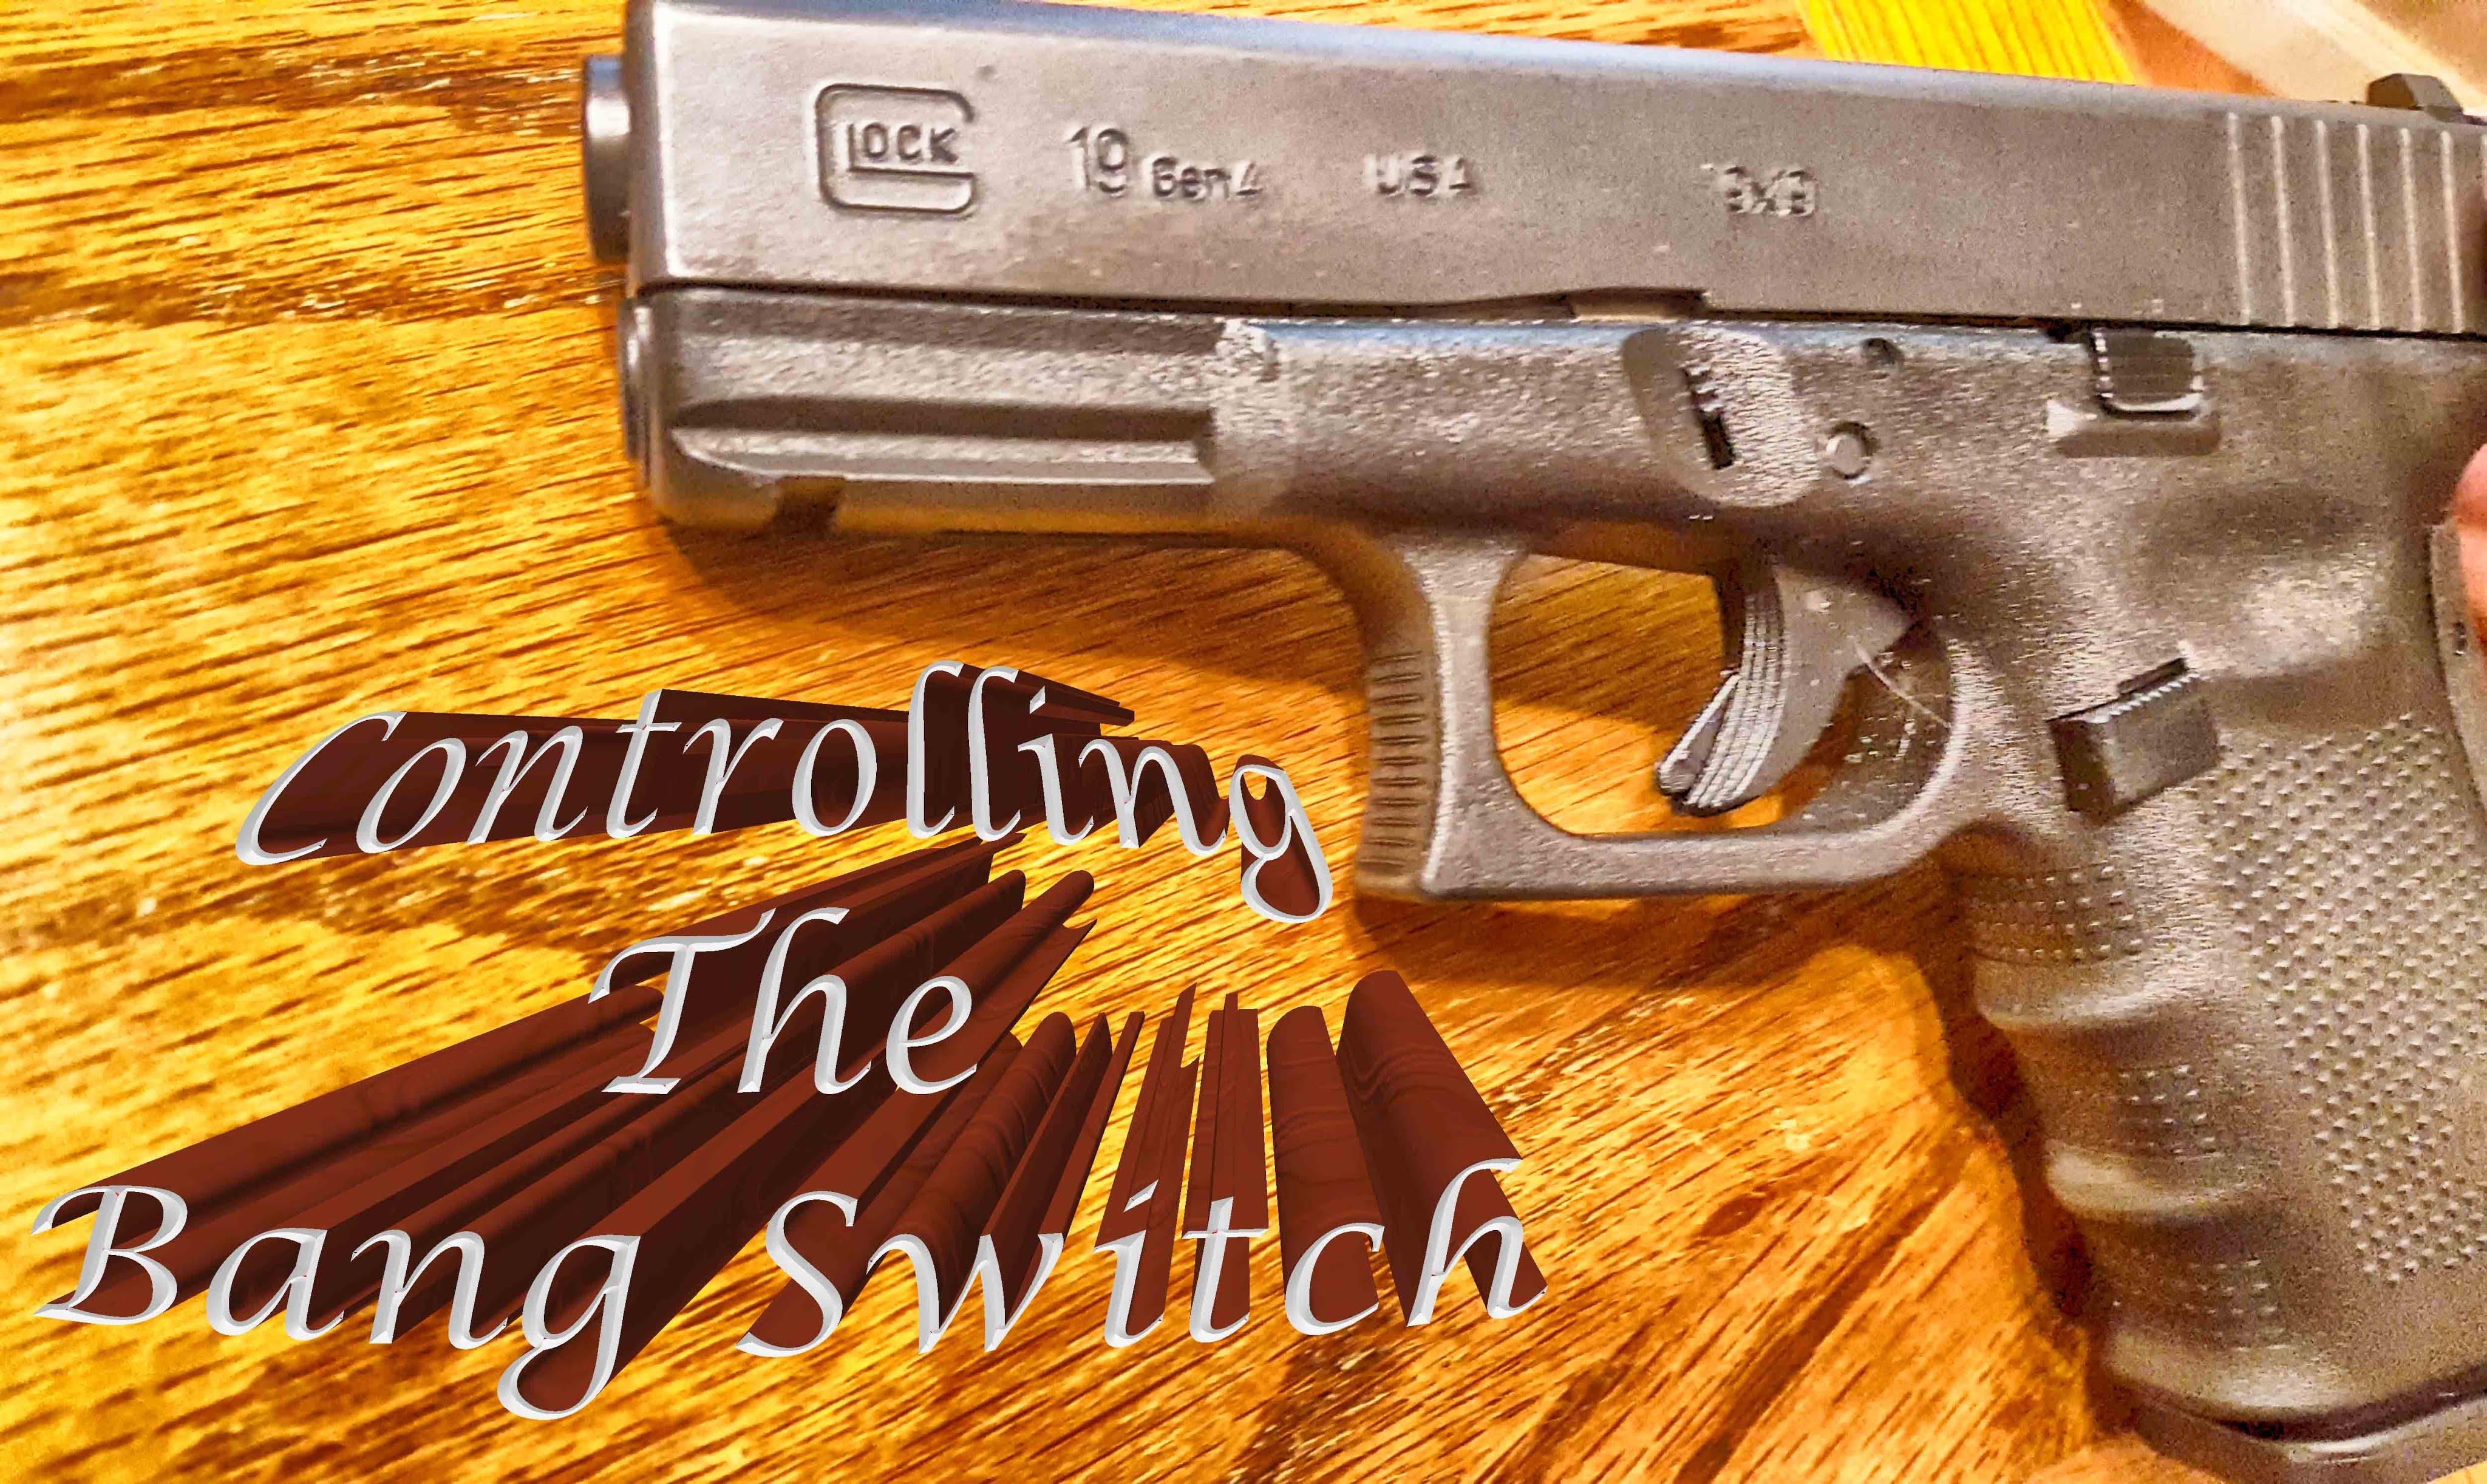 Pistol Trigger Control